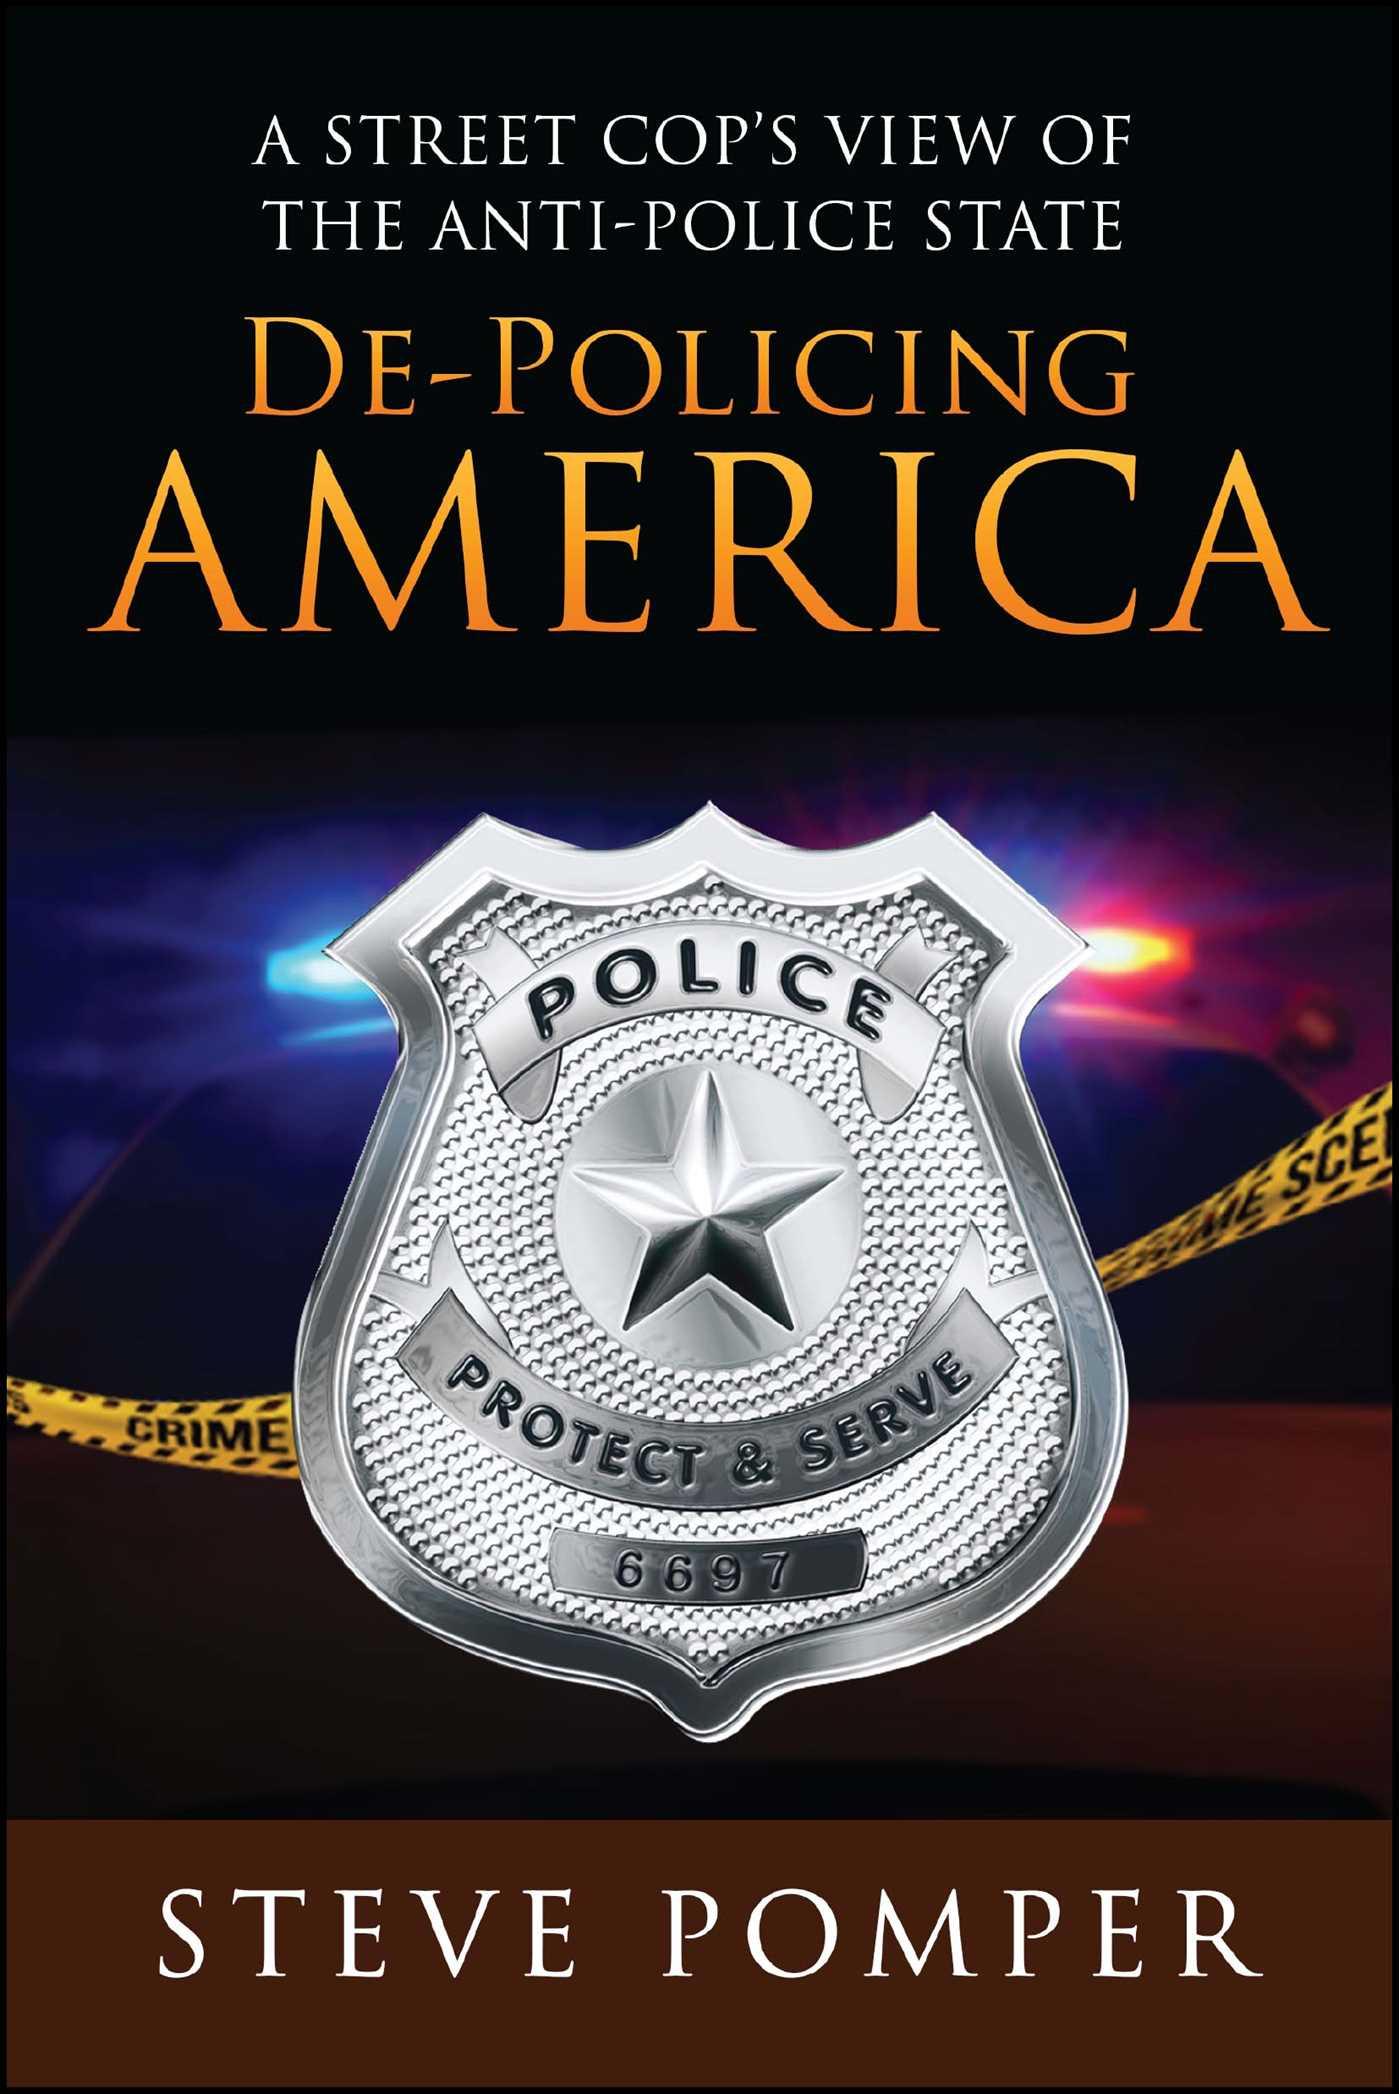 De policing america 9781682616697 hr